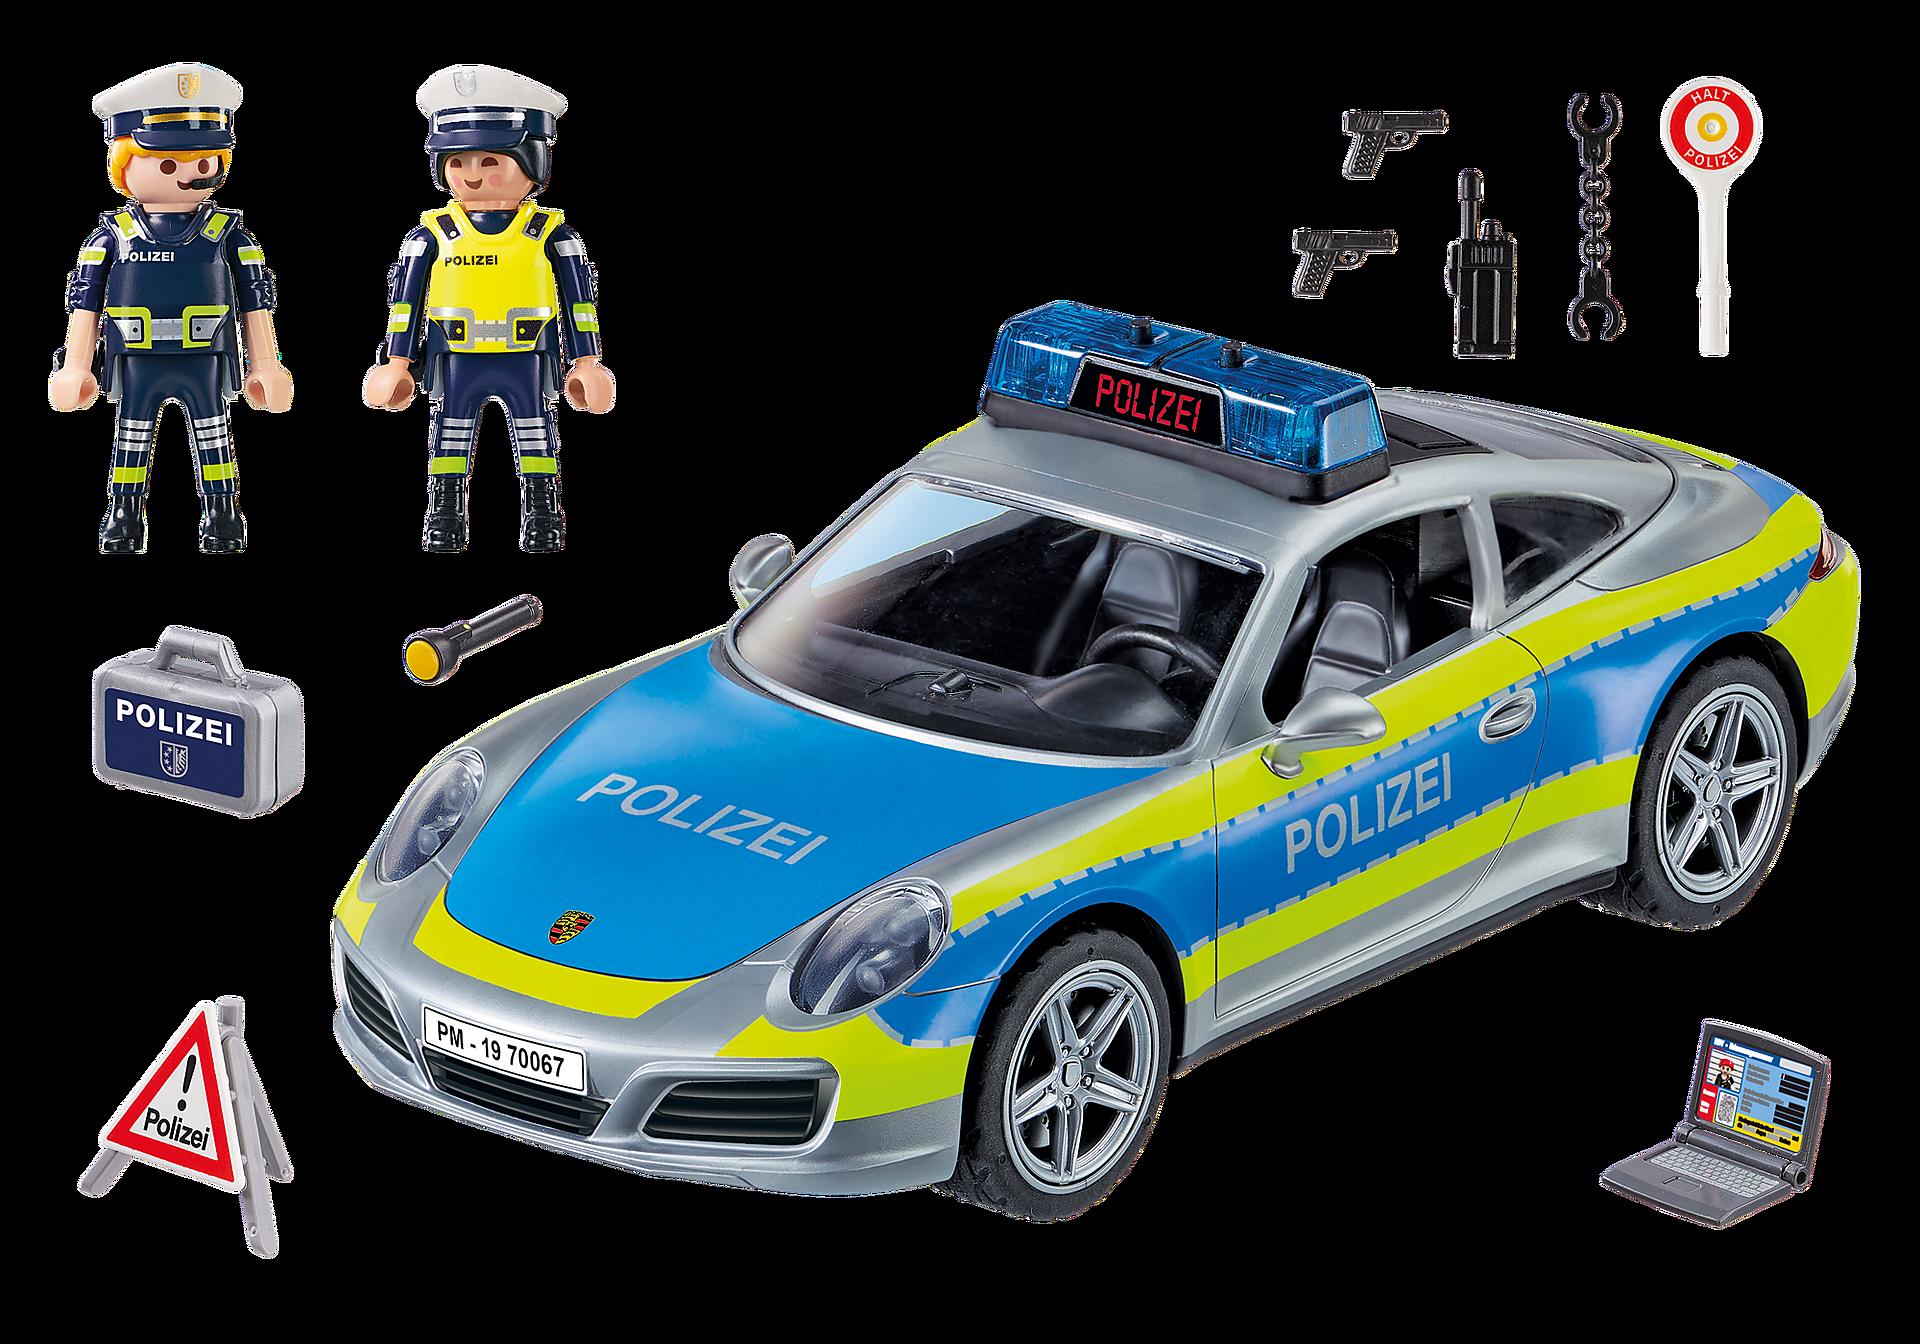 http://media.playmobil.com/i/playmobil/70067_product_box_back/Porsche 911 Carrera 4S Polizei